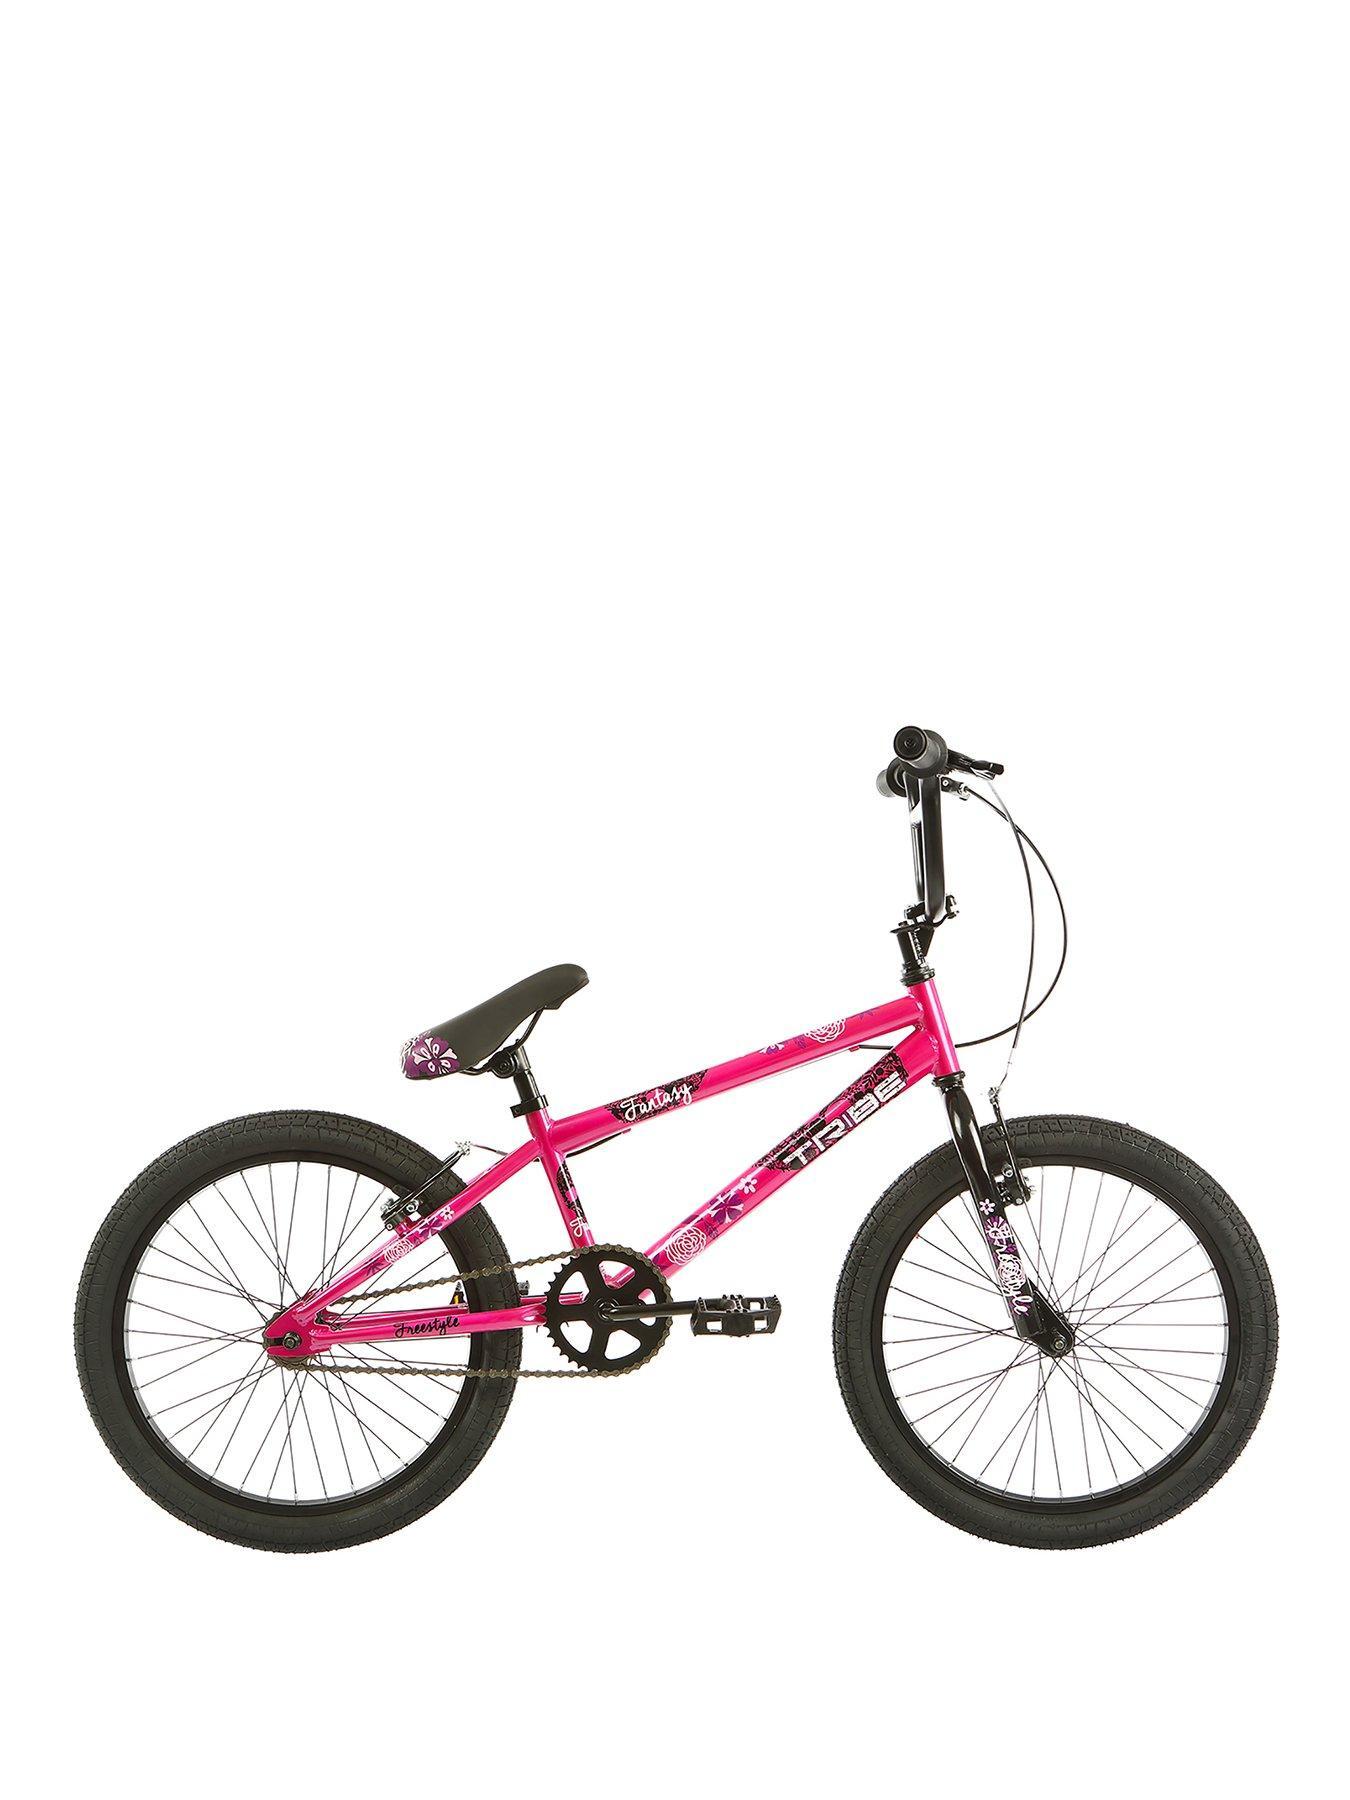 TRIBE Fantasy Girls BMX 20 inch Wheel